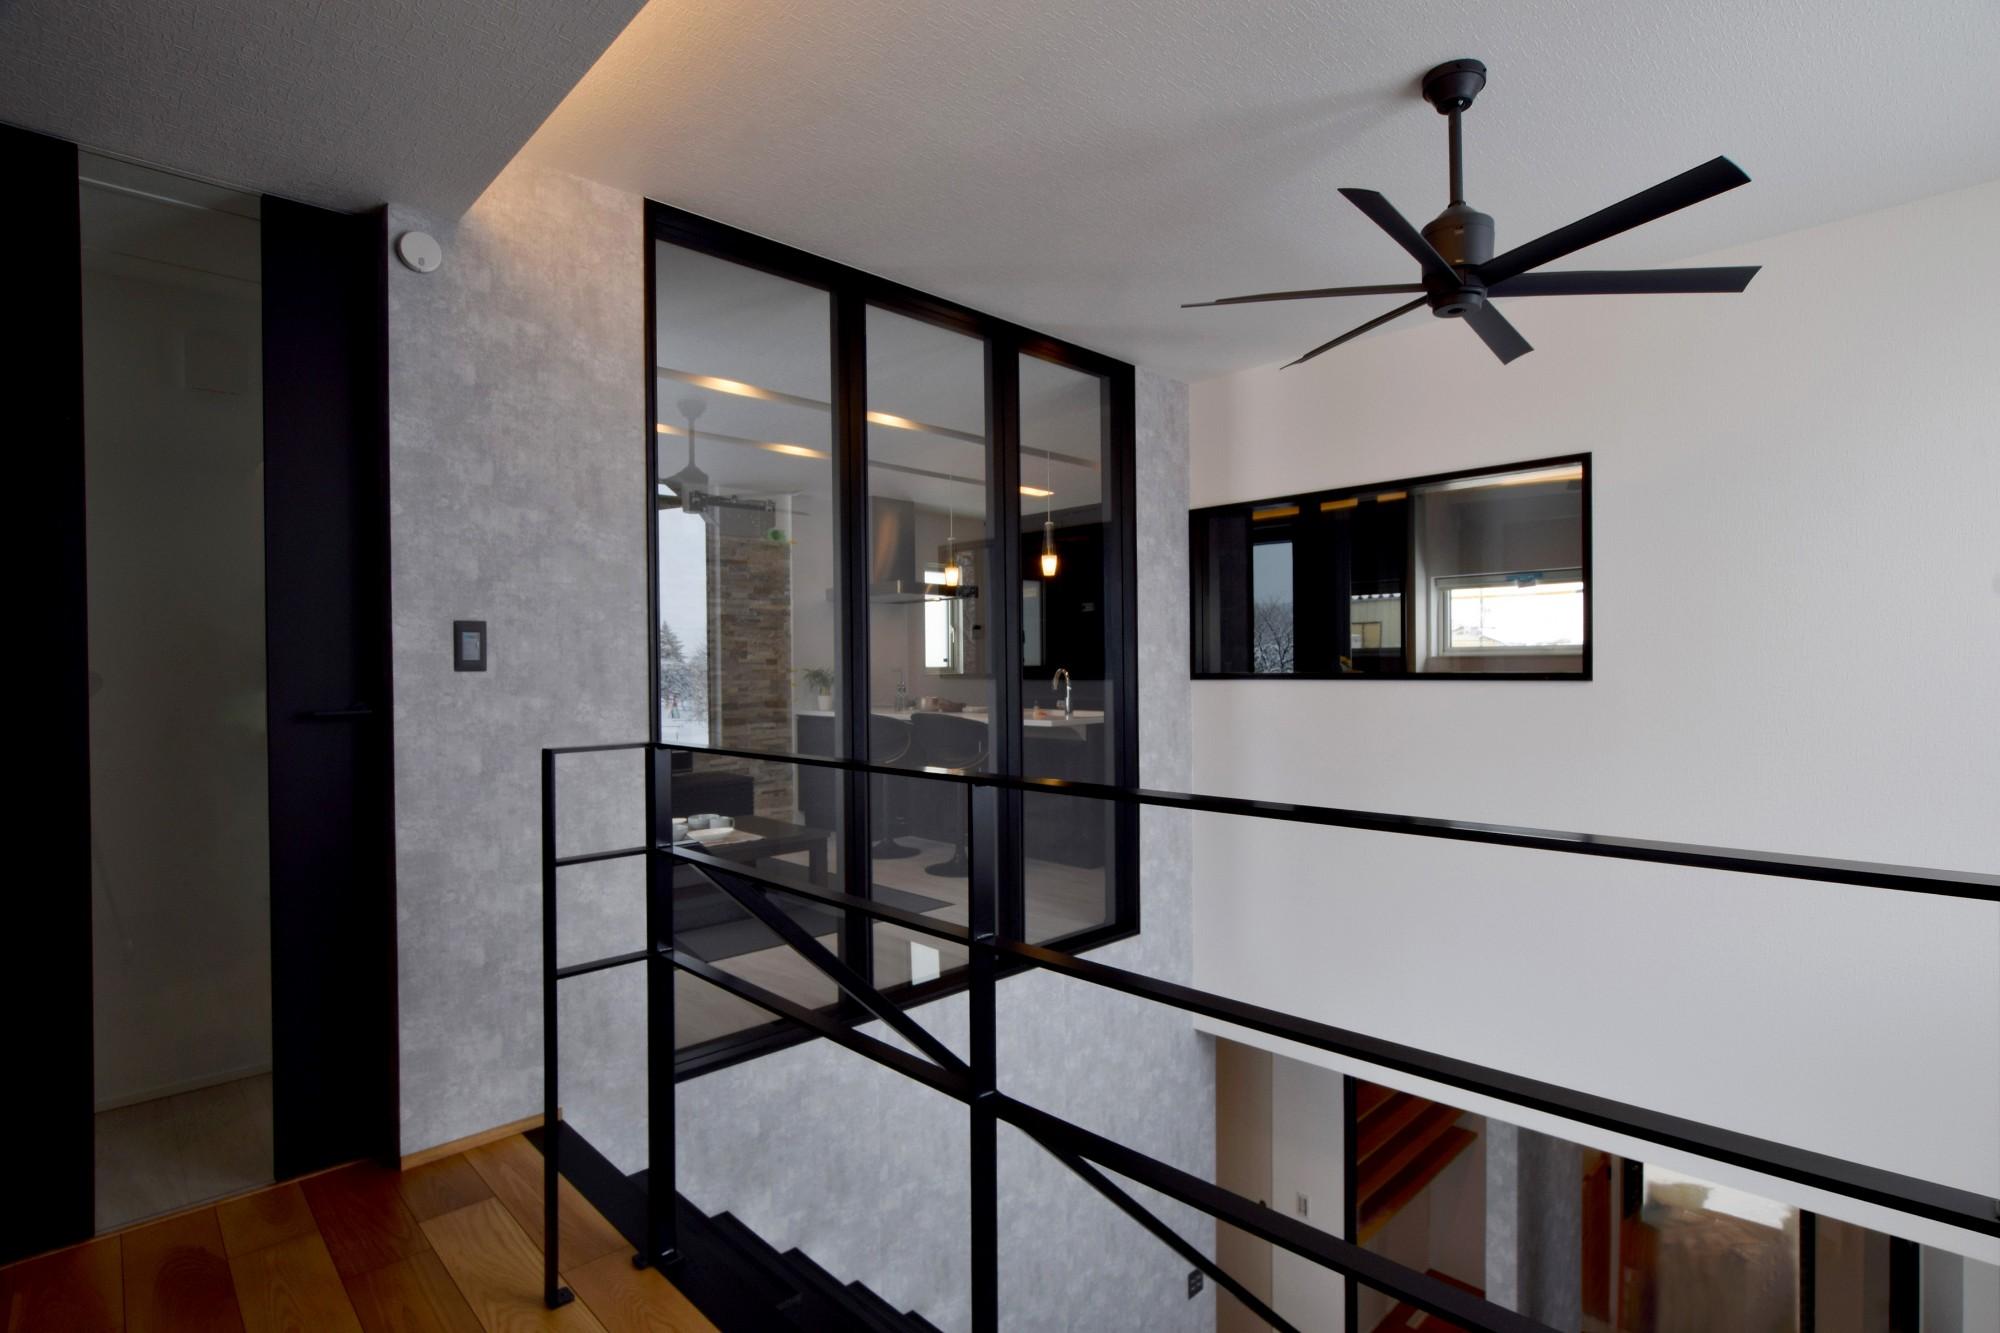 DETAIL HOME(ディテールホーム)「趣味と風景をたのしむ家」のヴィンテージなリビング・ダイニングの実例写真